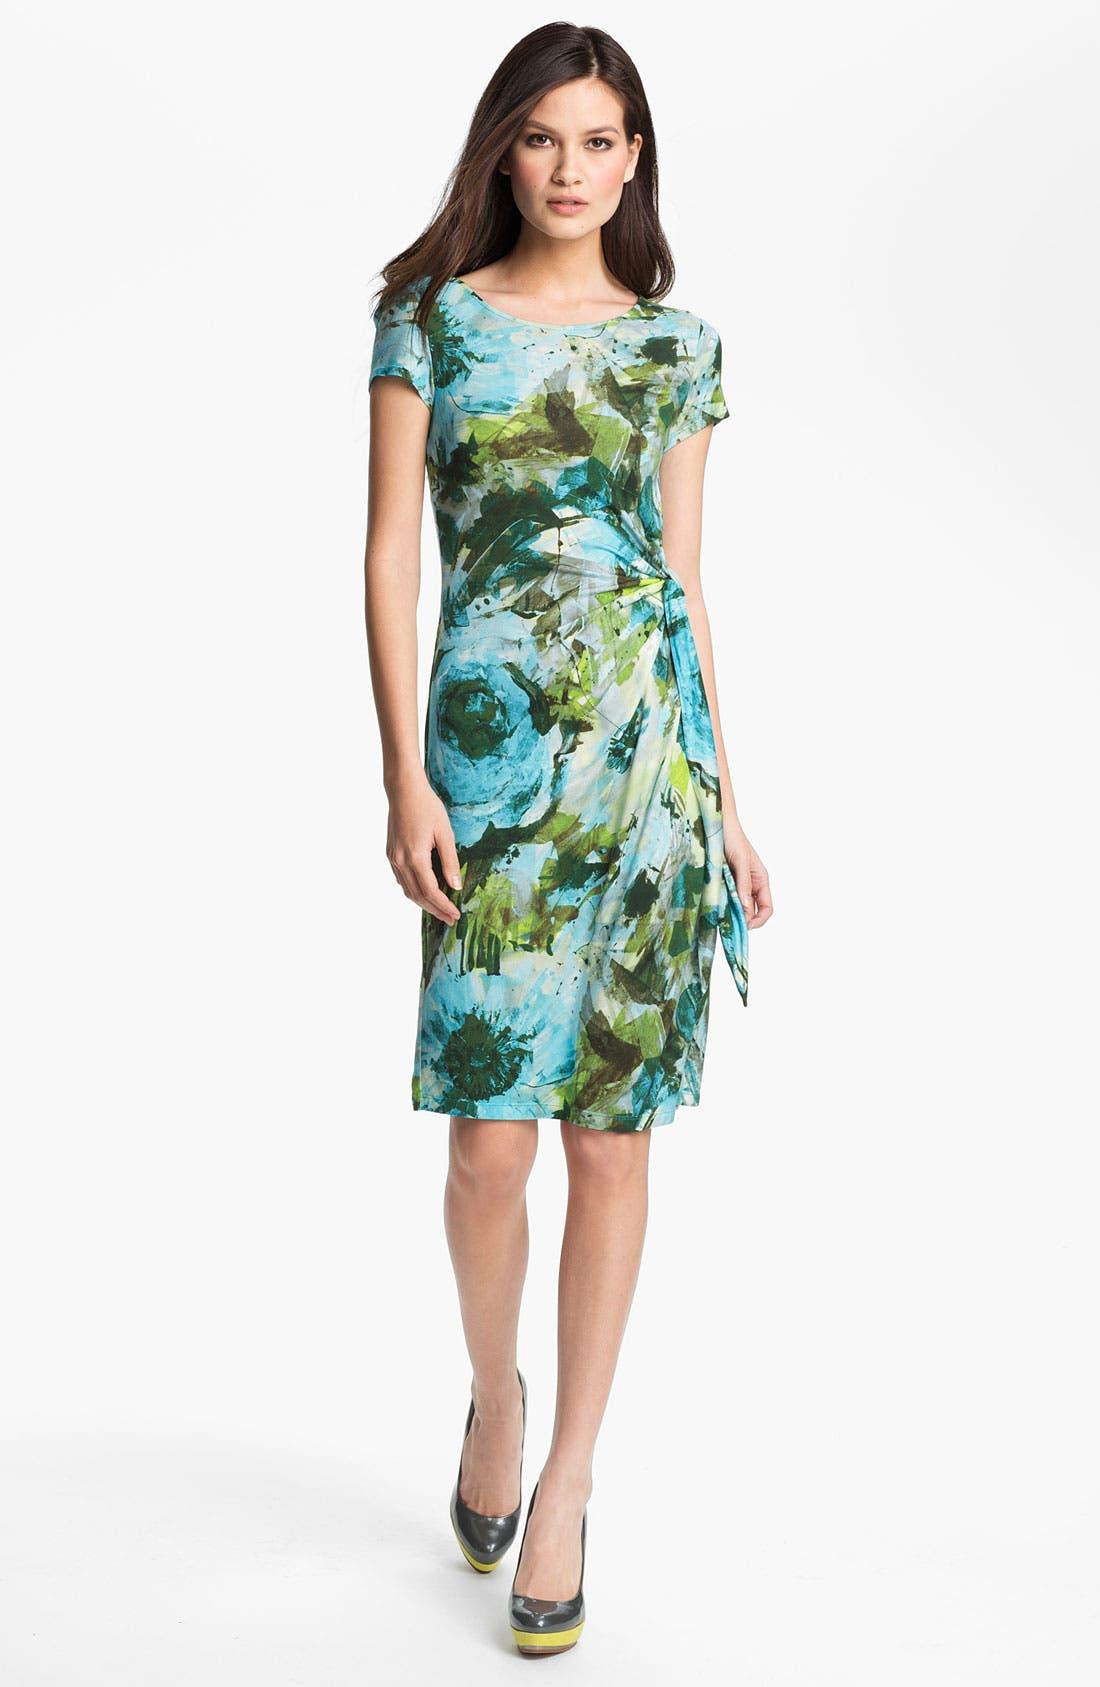 Alternate Image 1 Selected - Lafayette 148 New York Garden Floral Jersey Dress